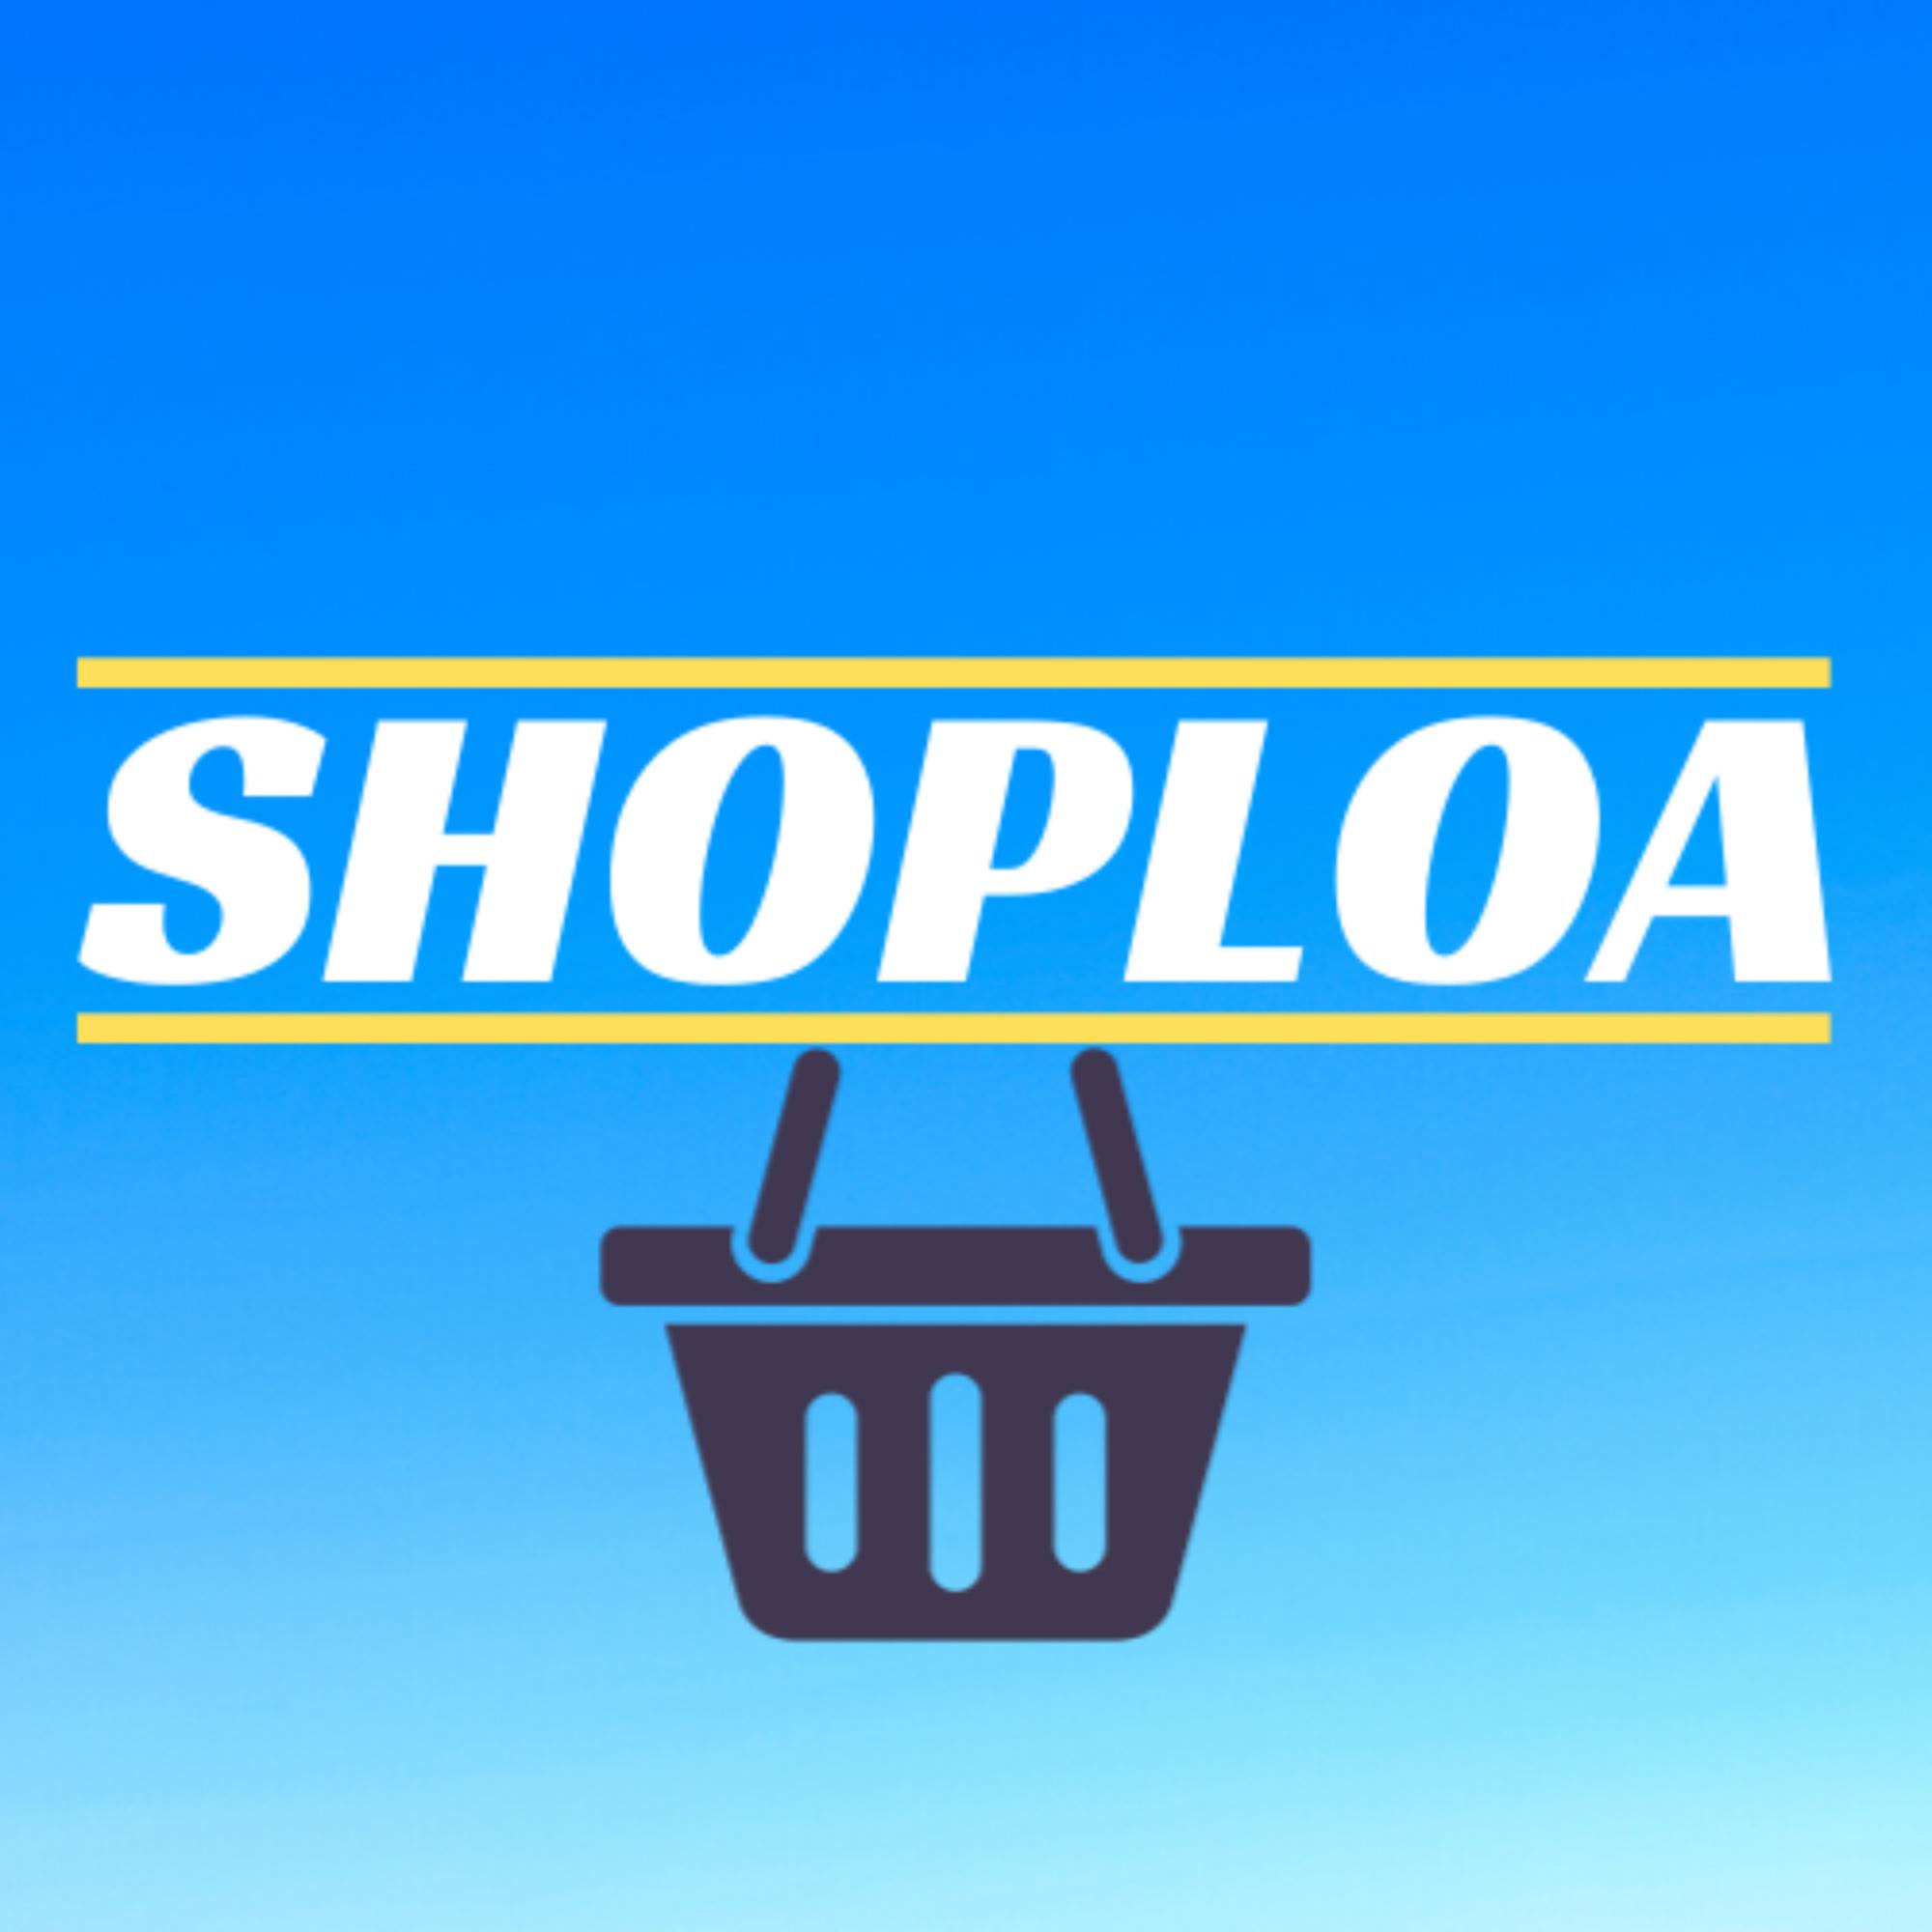 shoploa